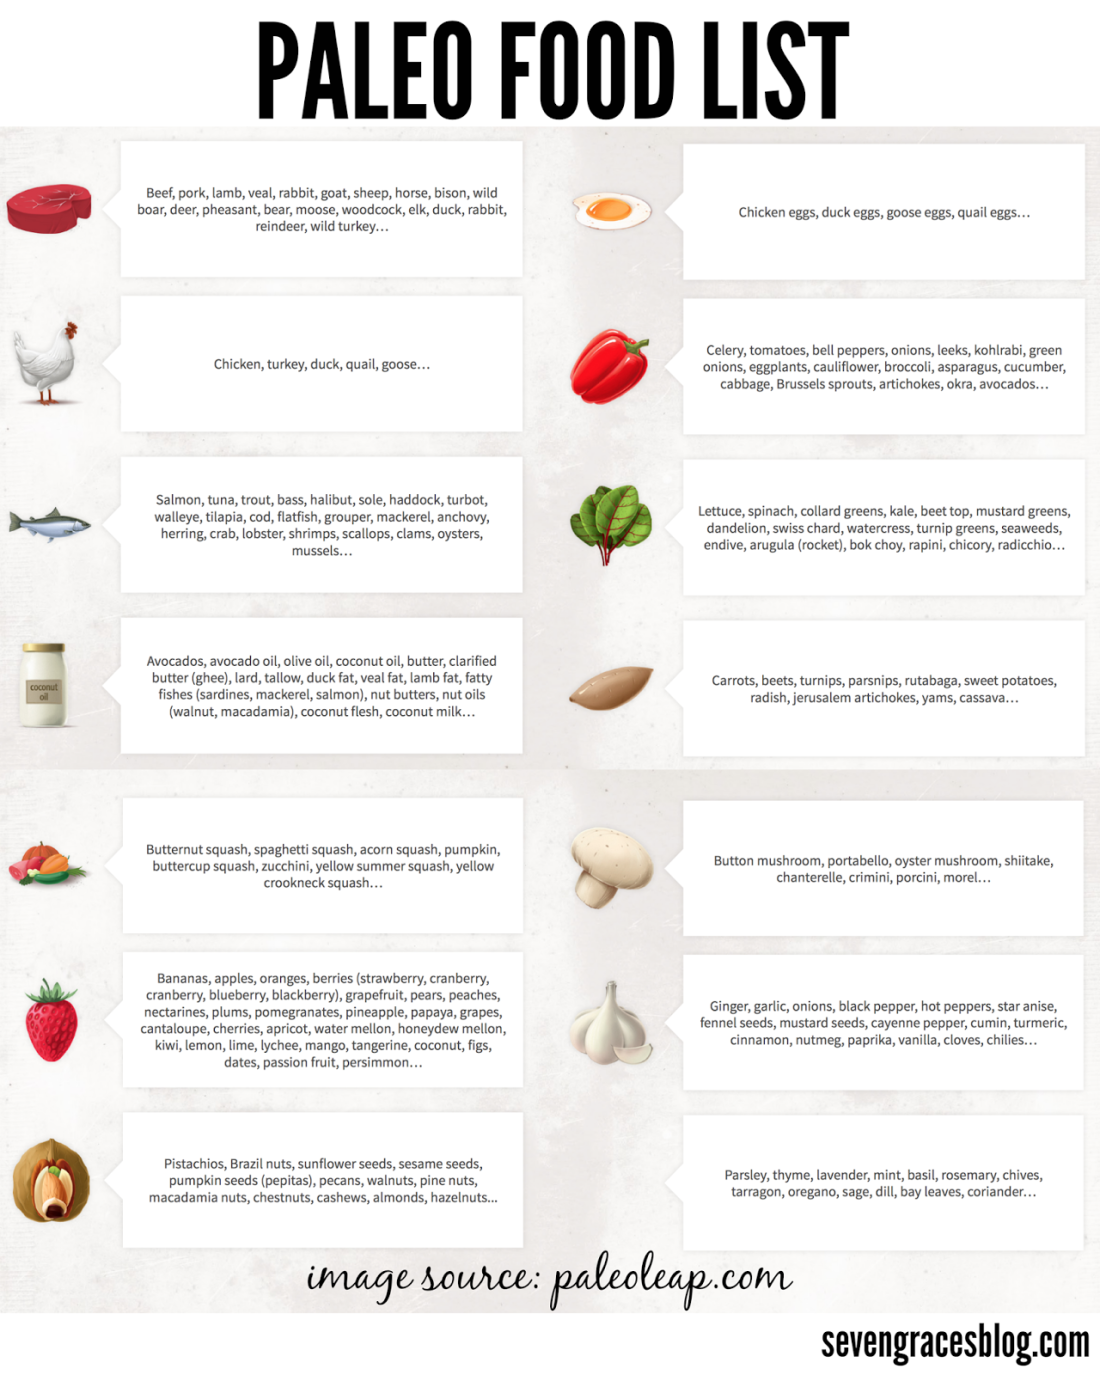 Paleo diet shopping list pdf dolapgnetband paleo diet shopping list pdf malvernweather Gallery